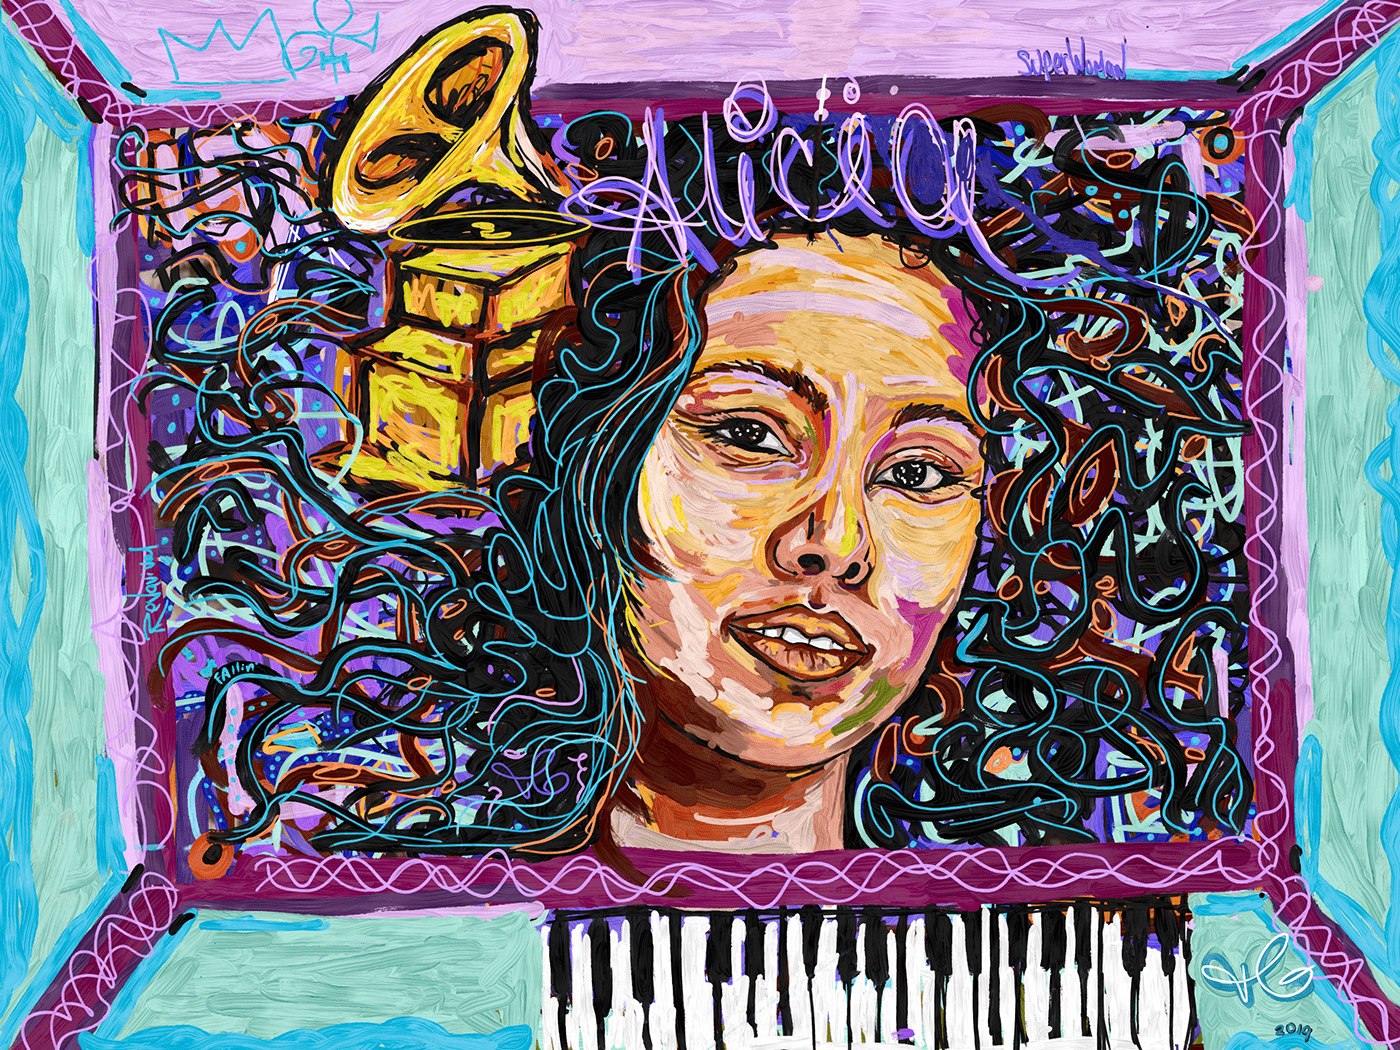 AdobeSketch Drawing  Alicia keys grammys Singer